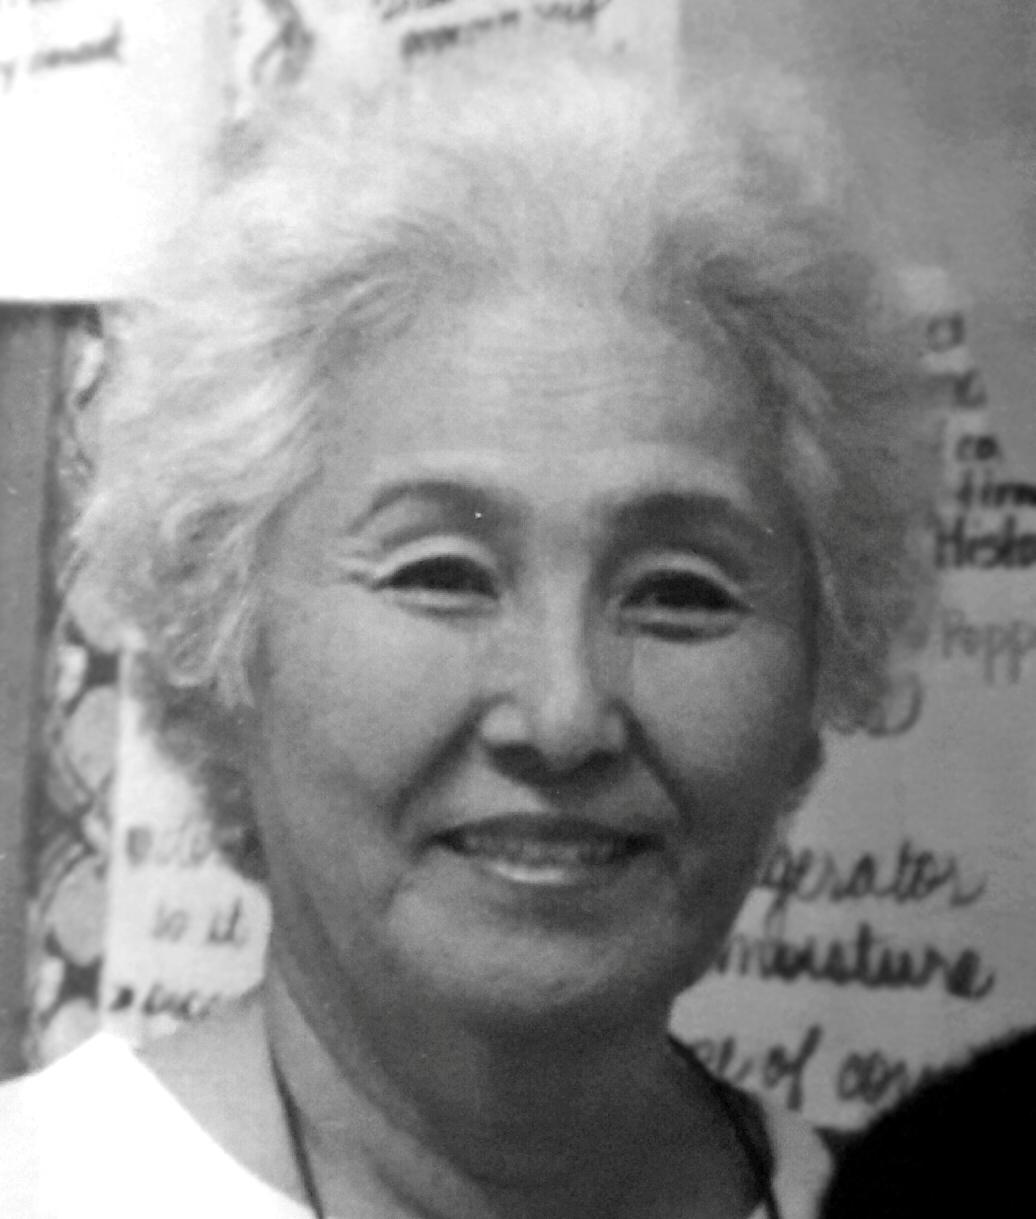 MILDRED HATSUKO FUJIMOTO